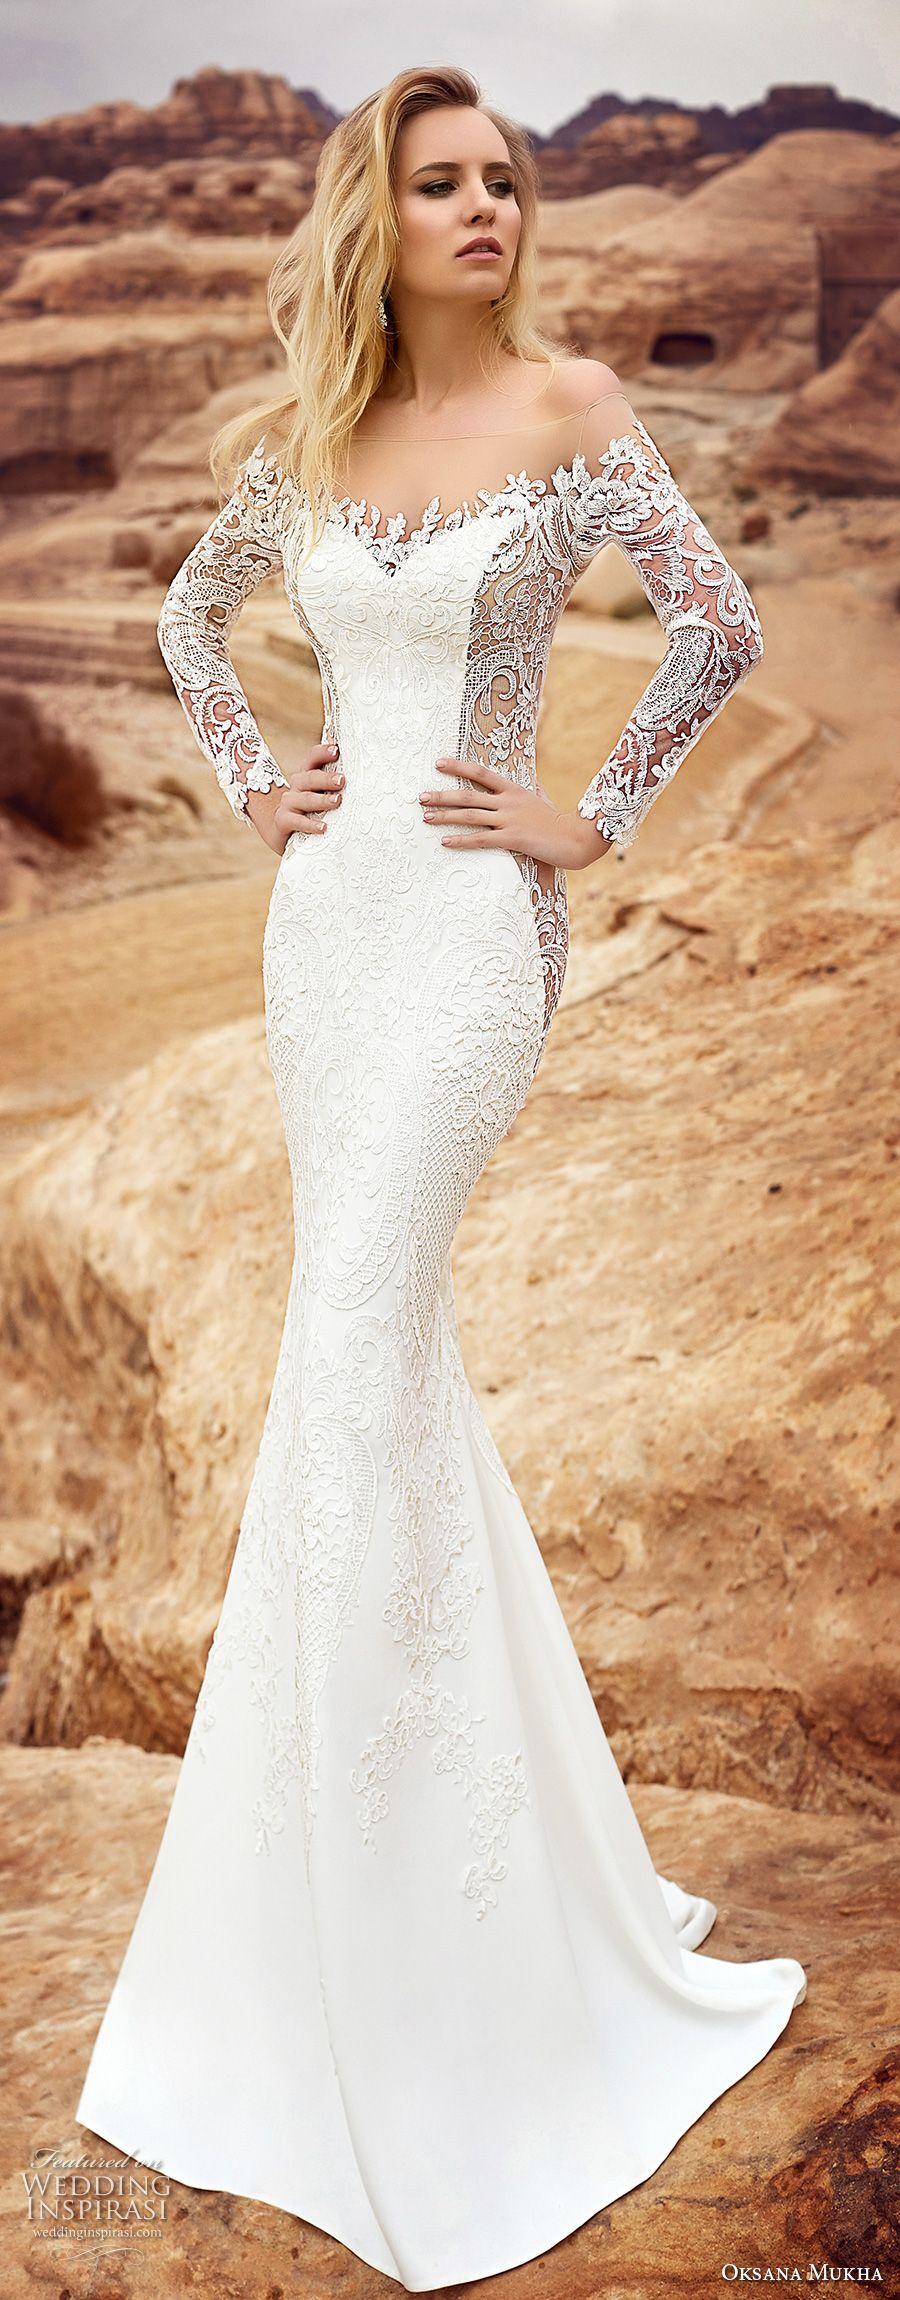 Oksana mukha wedding dresses neckline wedding dress and shoulder